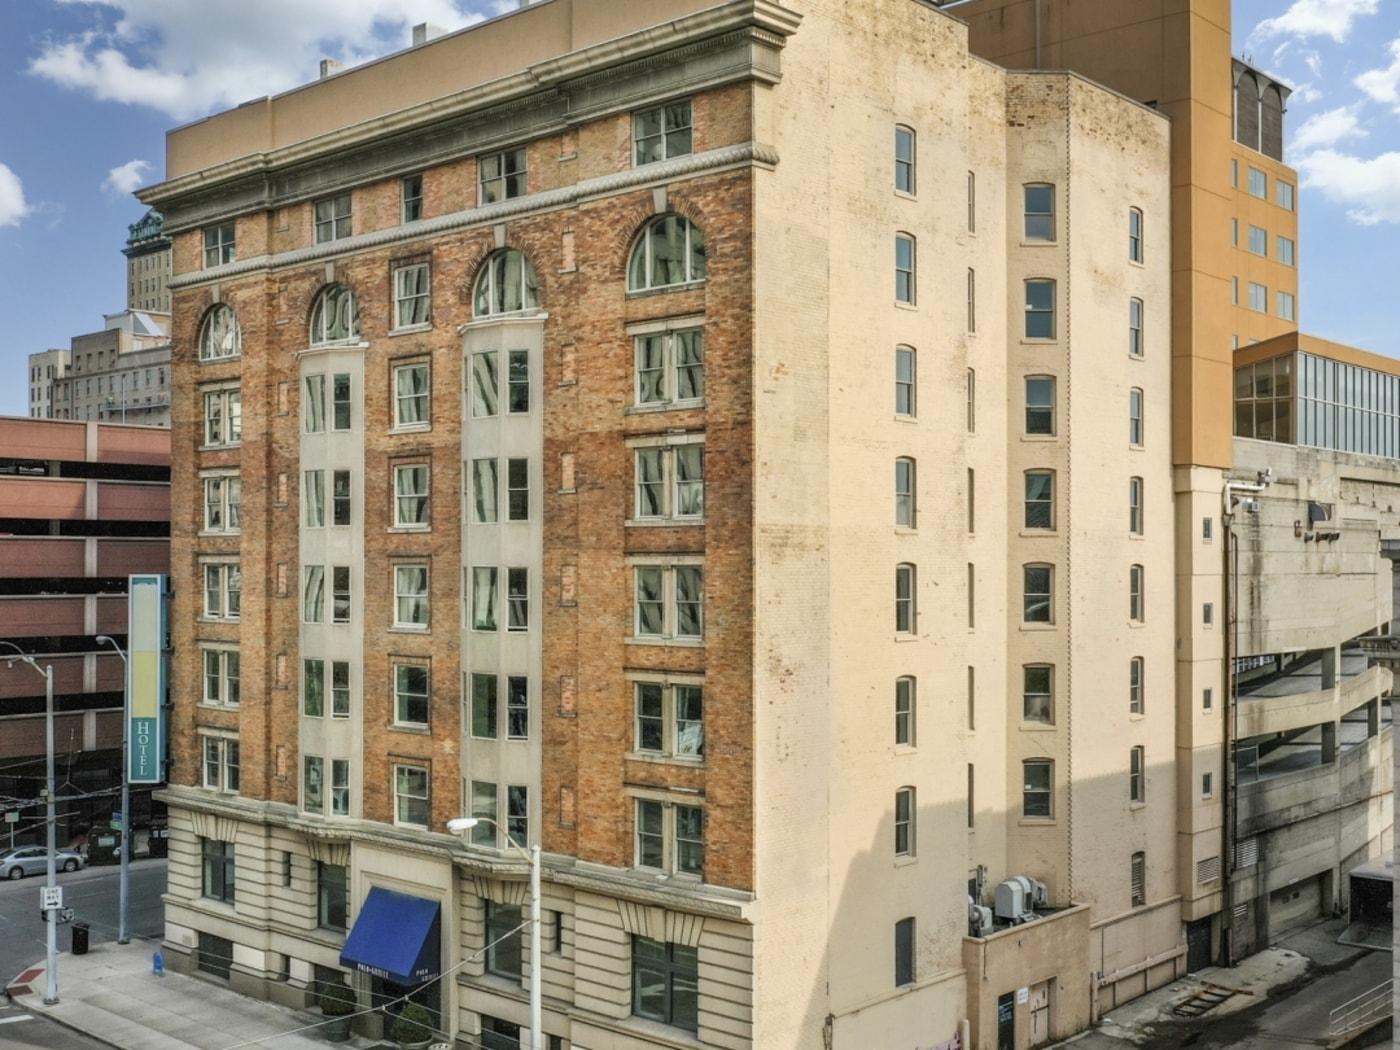 Dayton Grand Hotel Property For Sale Dayton Jll